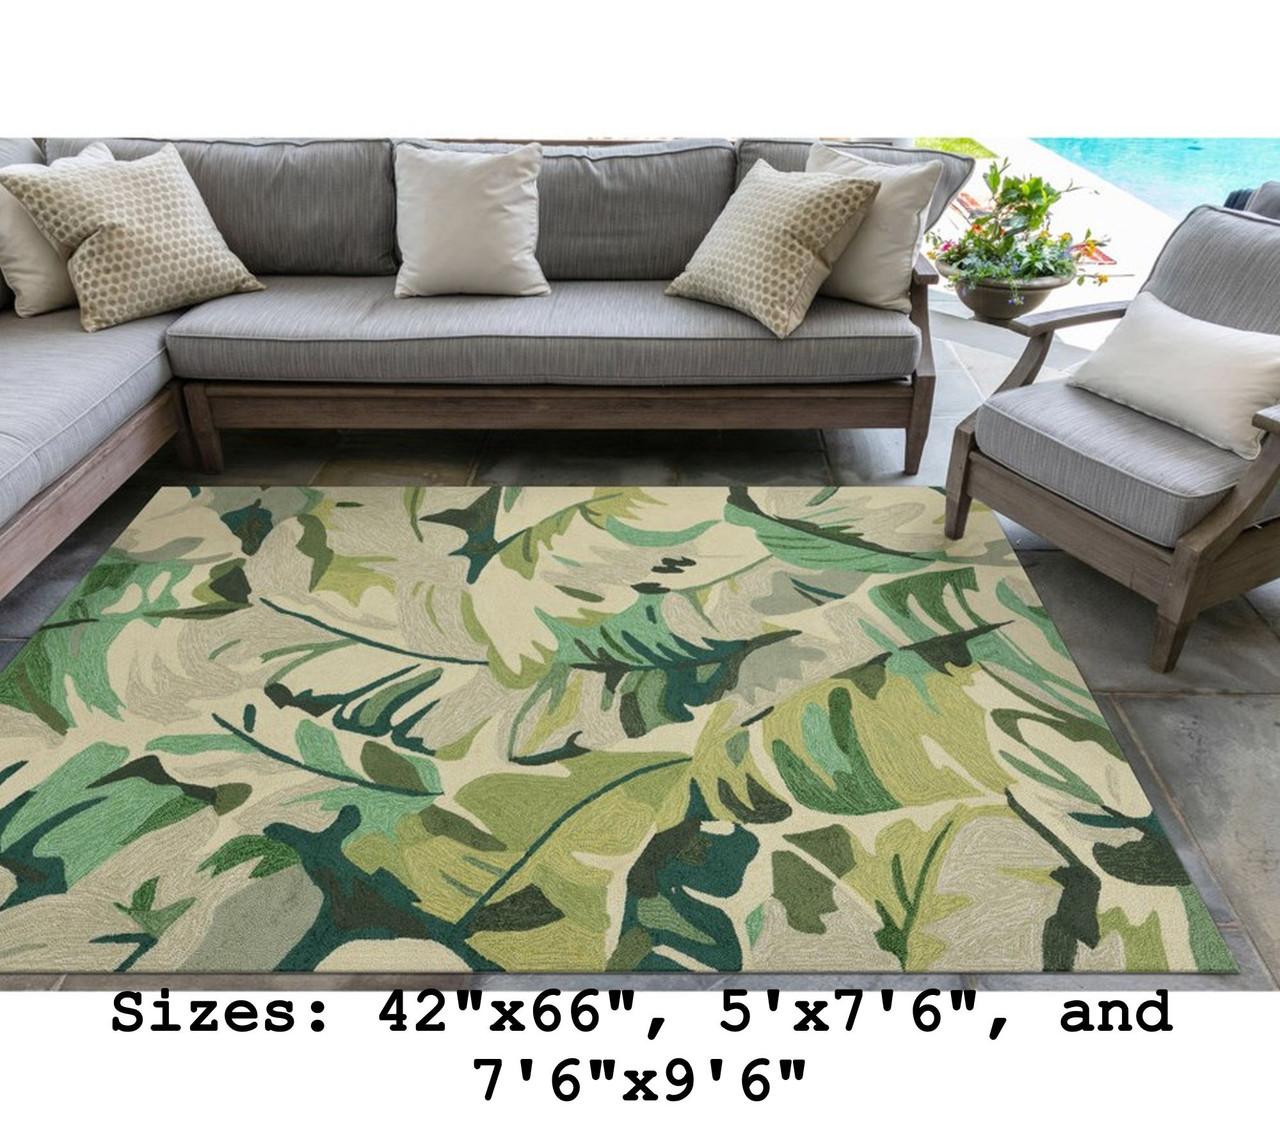 Green Capri Palm Leaf Indoor/Outdoor Rug - Large Rectangle Lifestyle